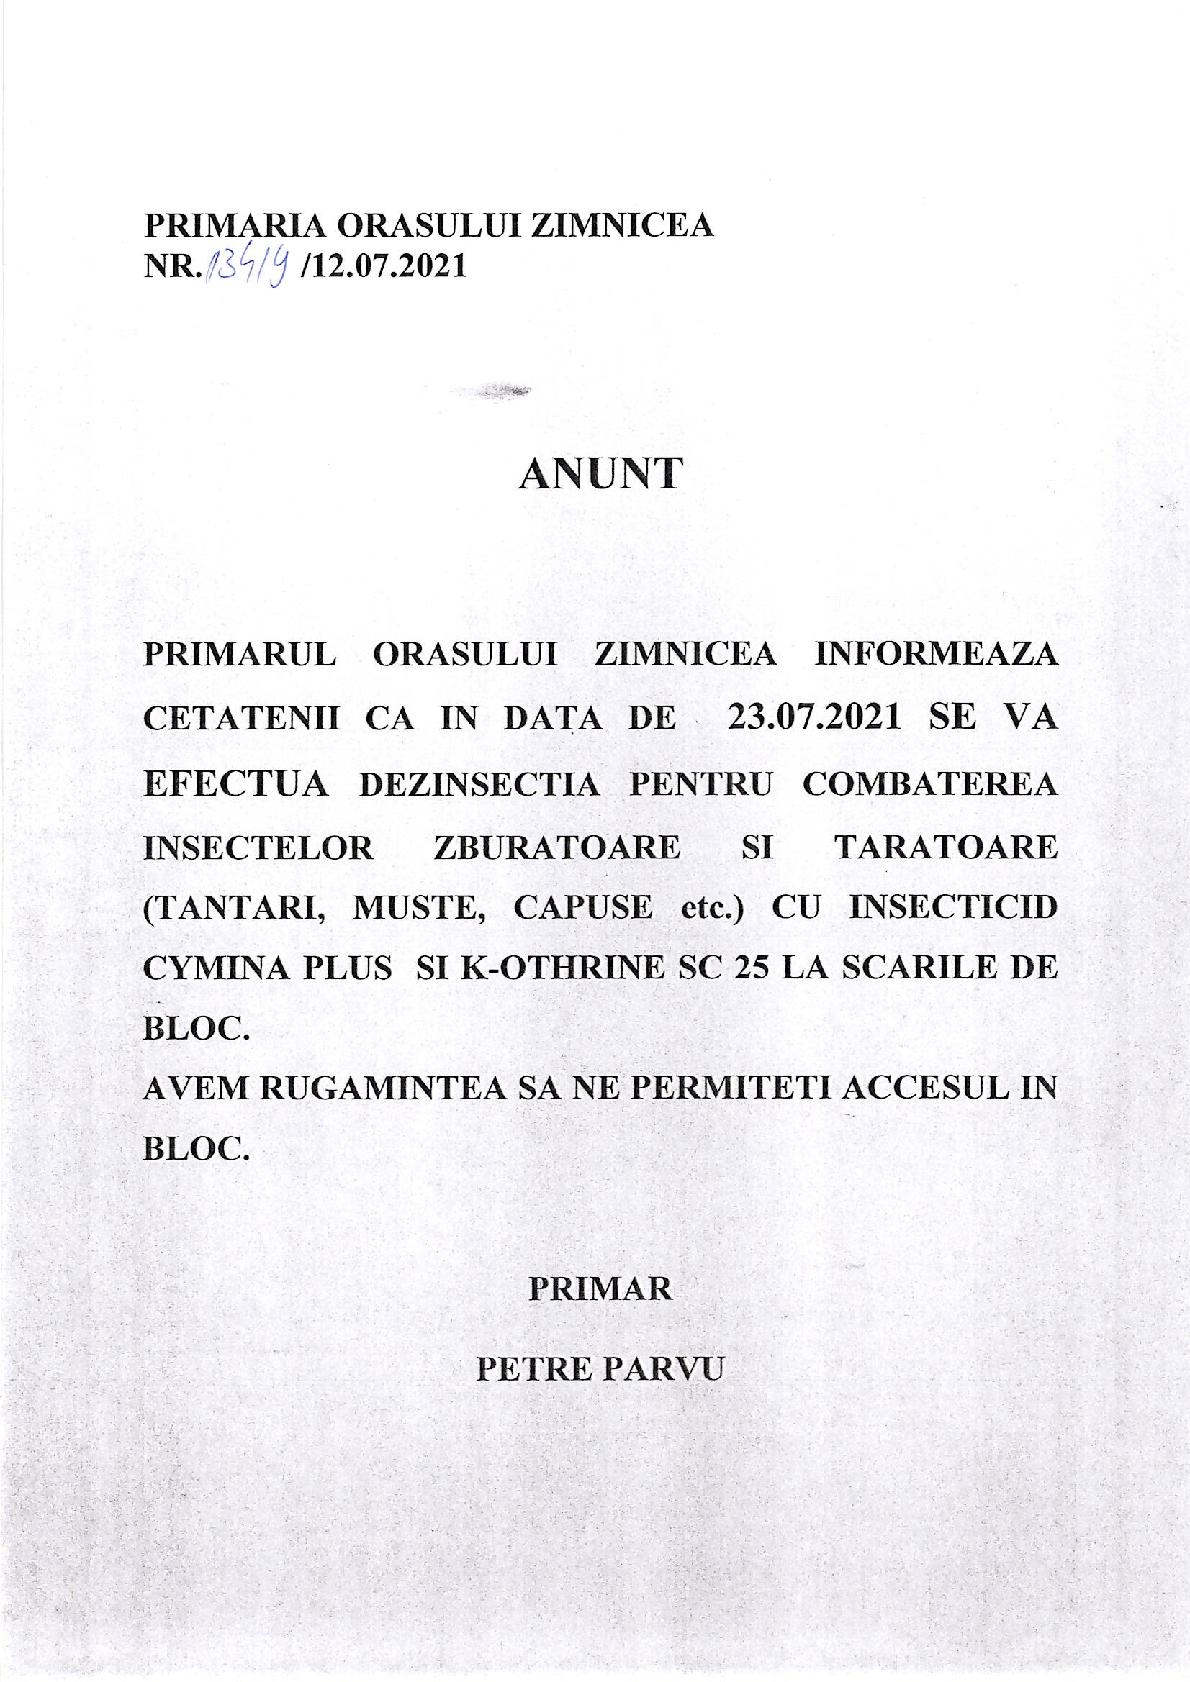 13.07.2021 - Anunț tratament dezinsecție